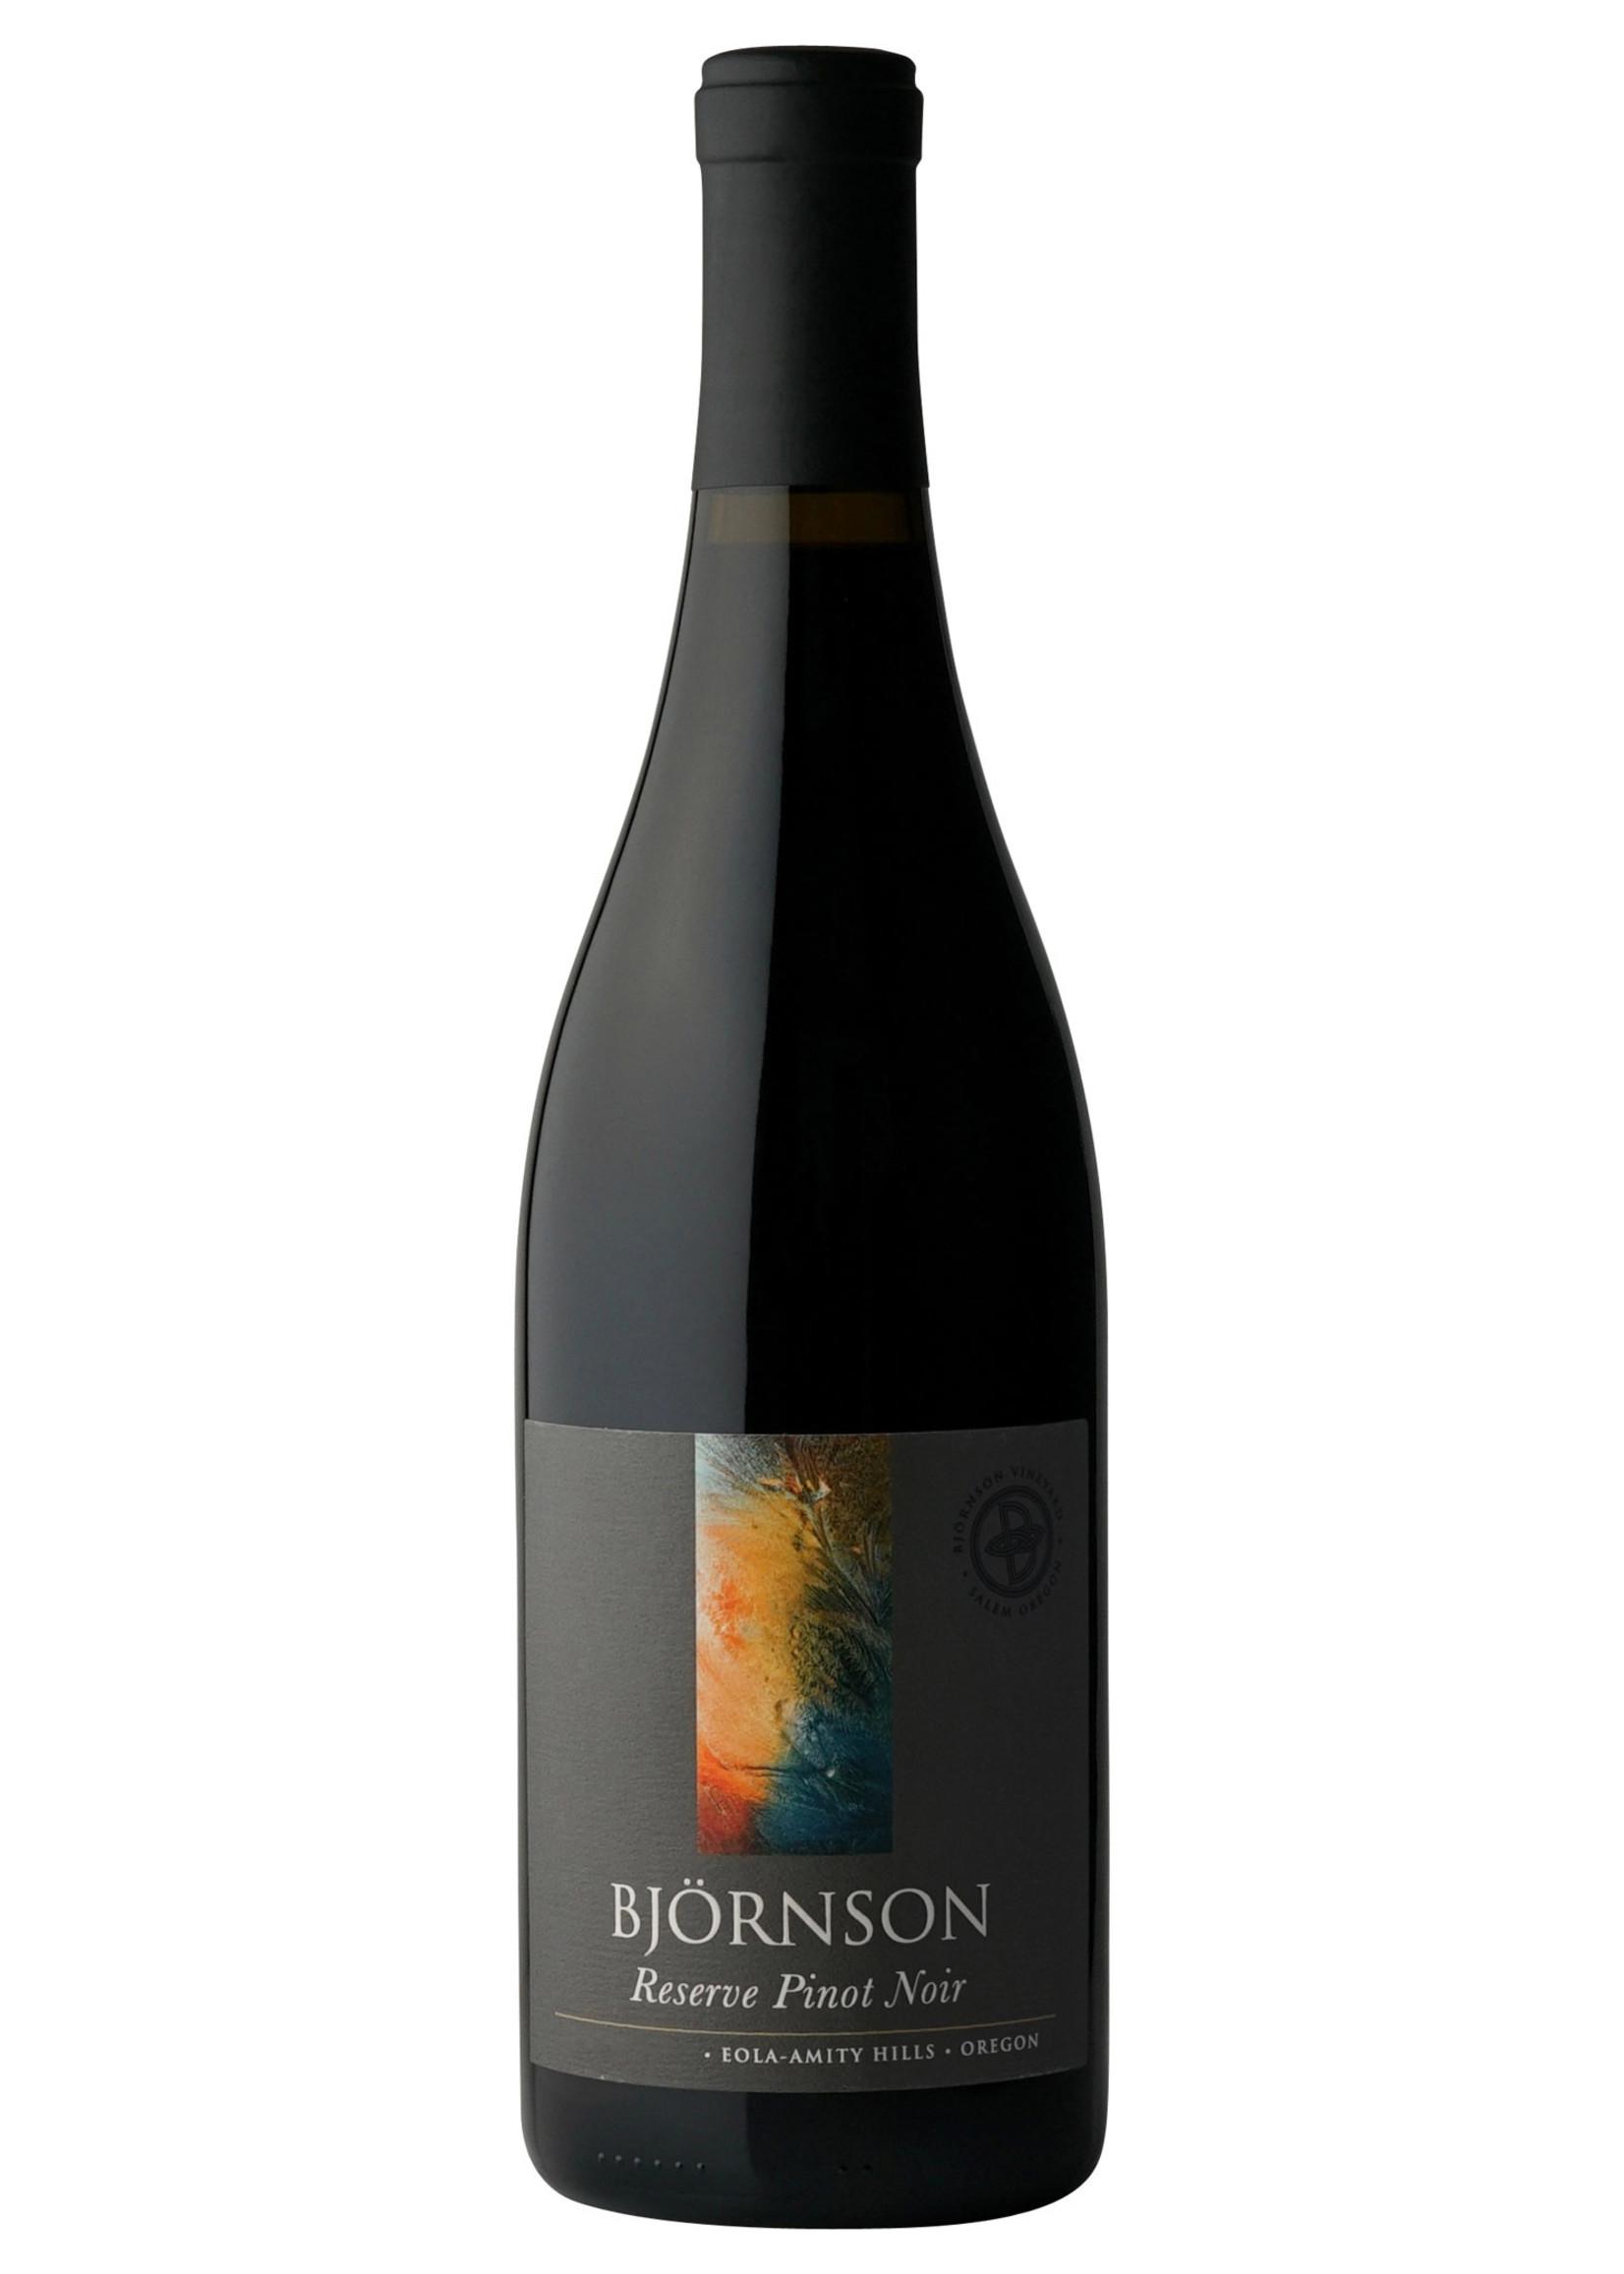 Bjornson Reserve Pinot Noir